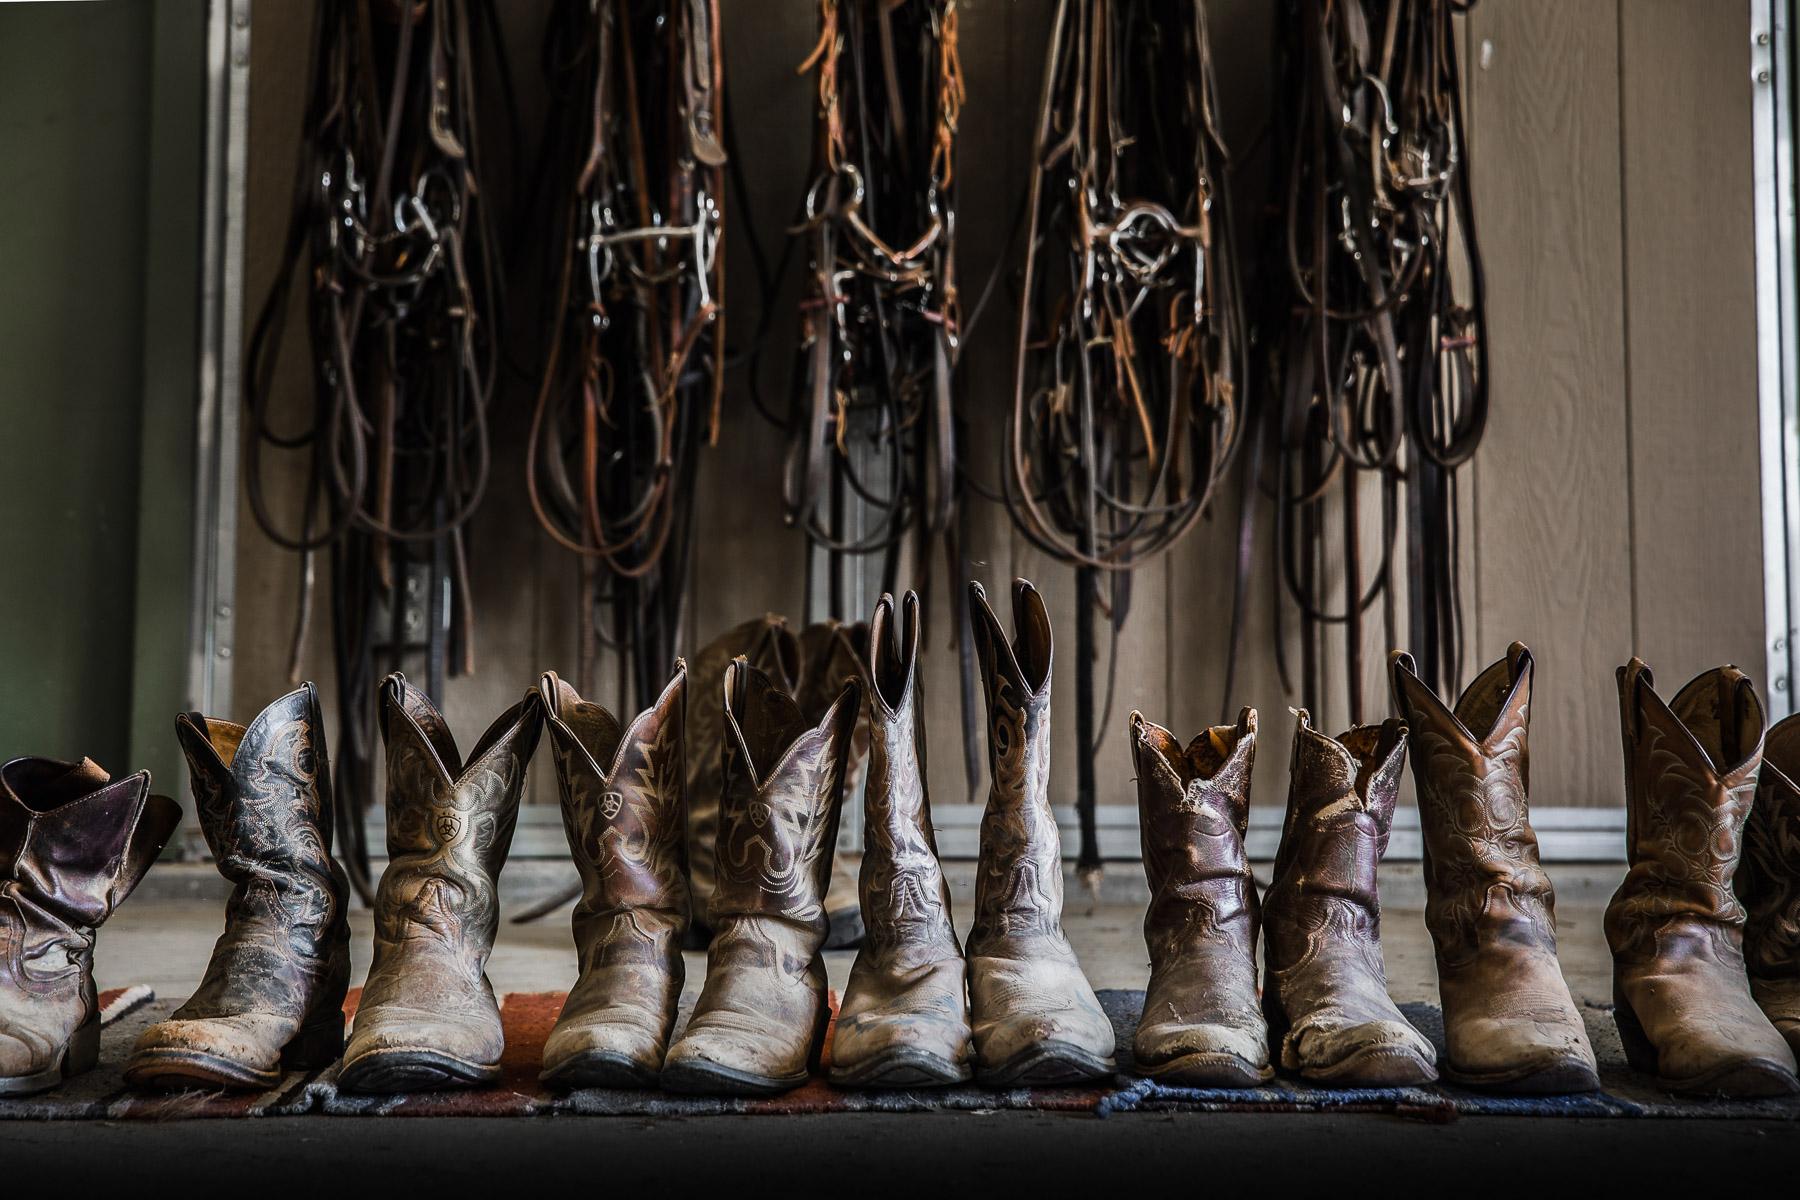 cowboy-leather-boots-austin-texas-horse-photography.jpg